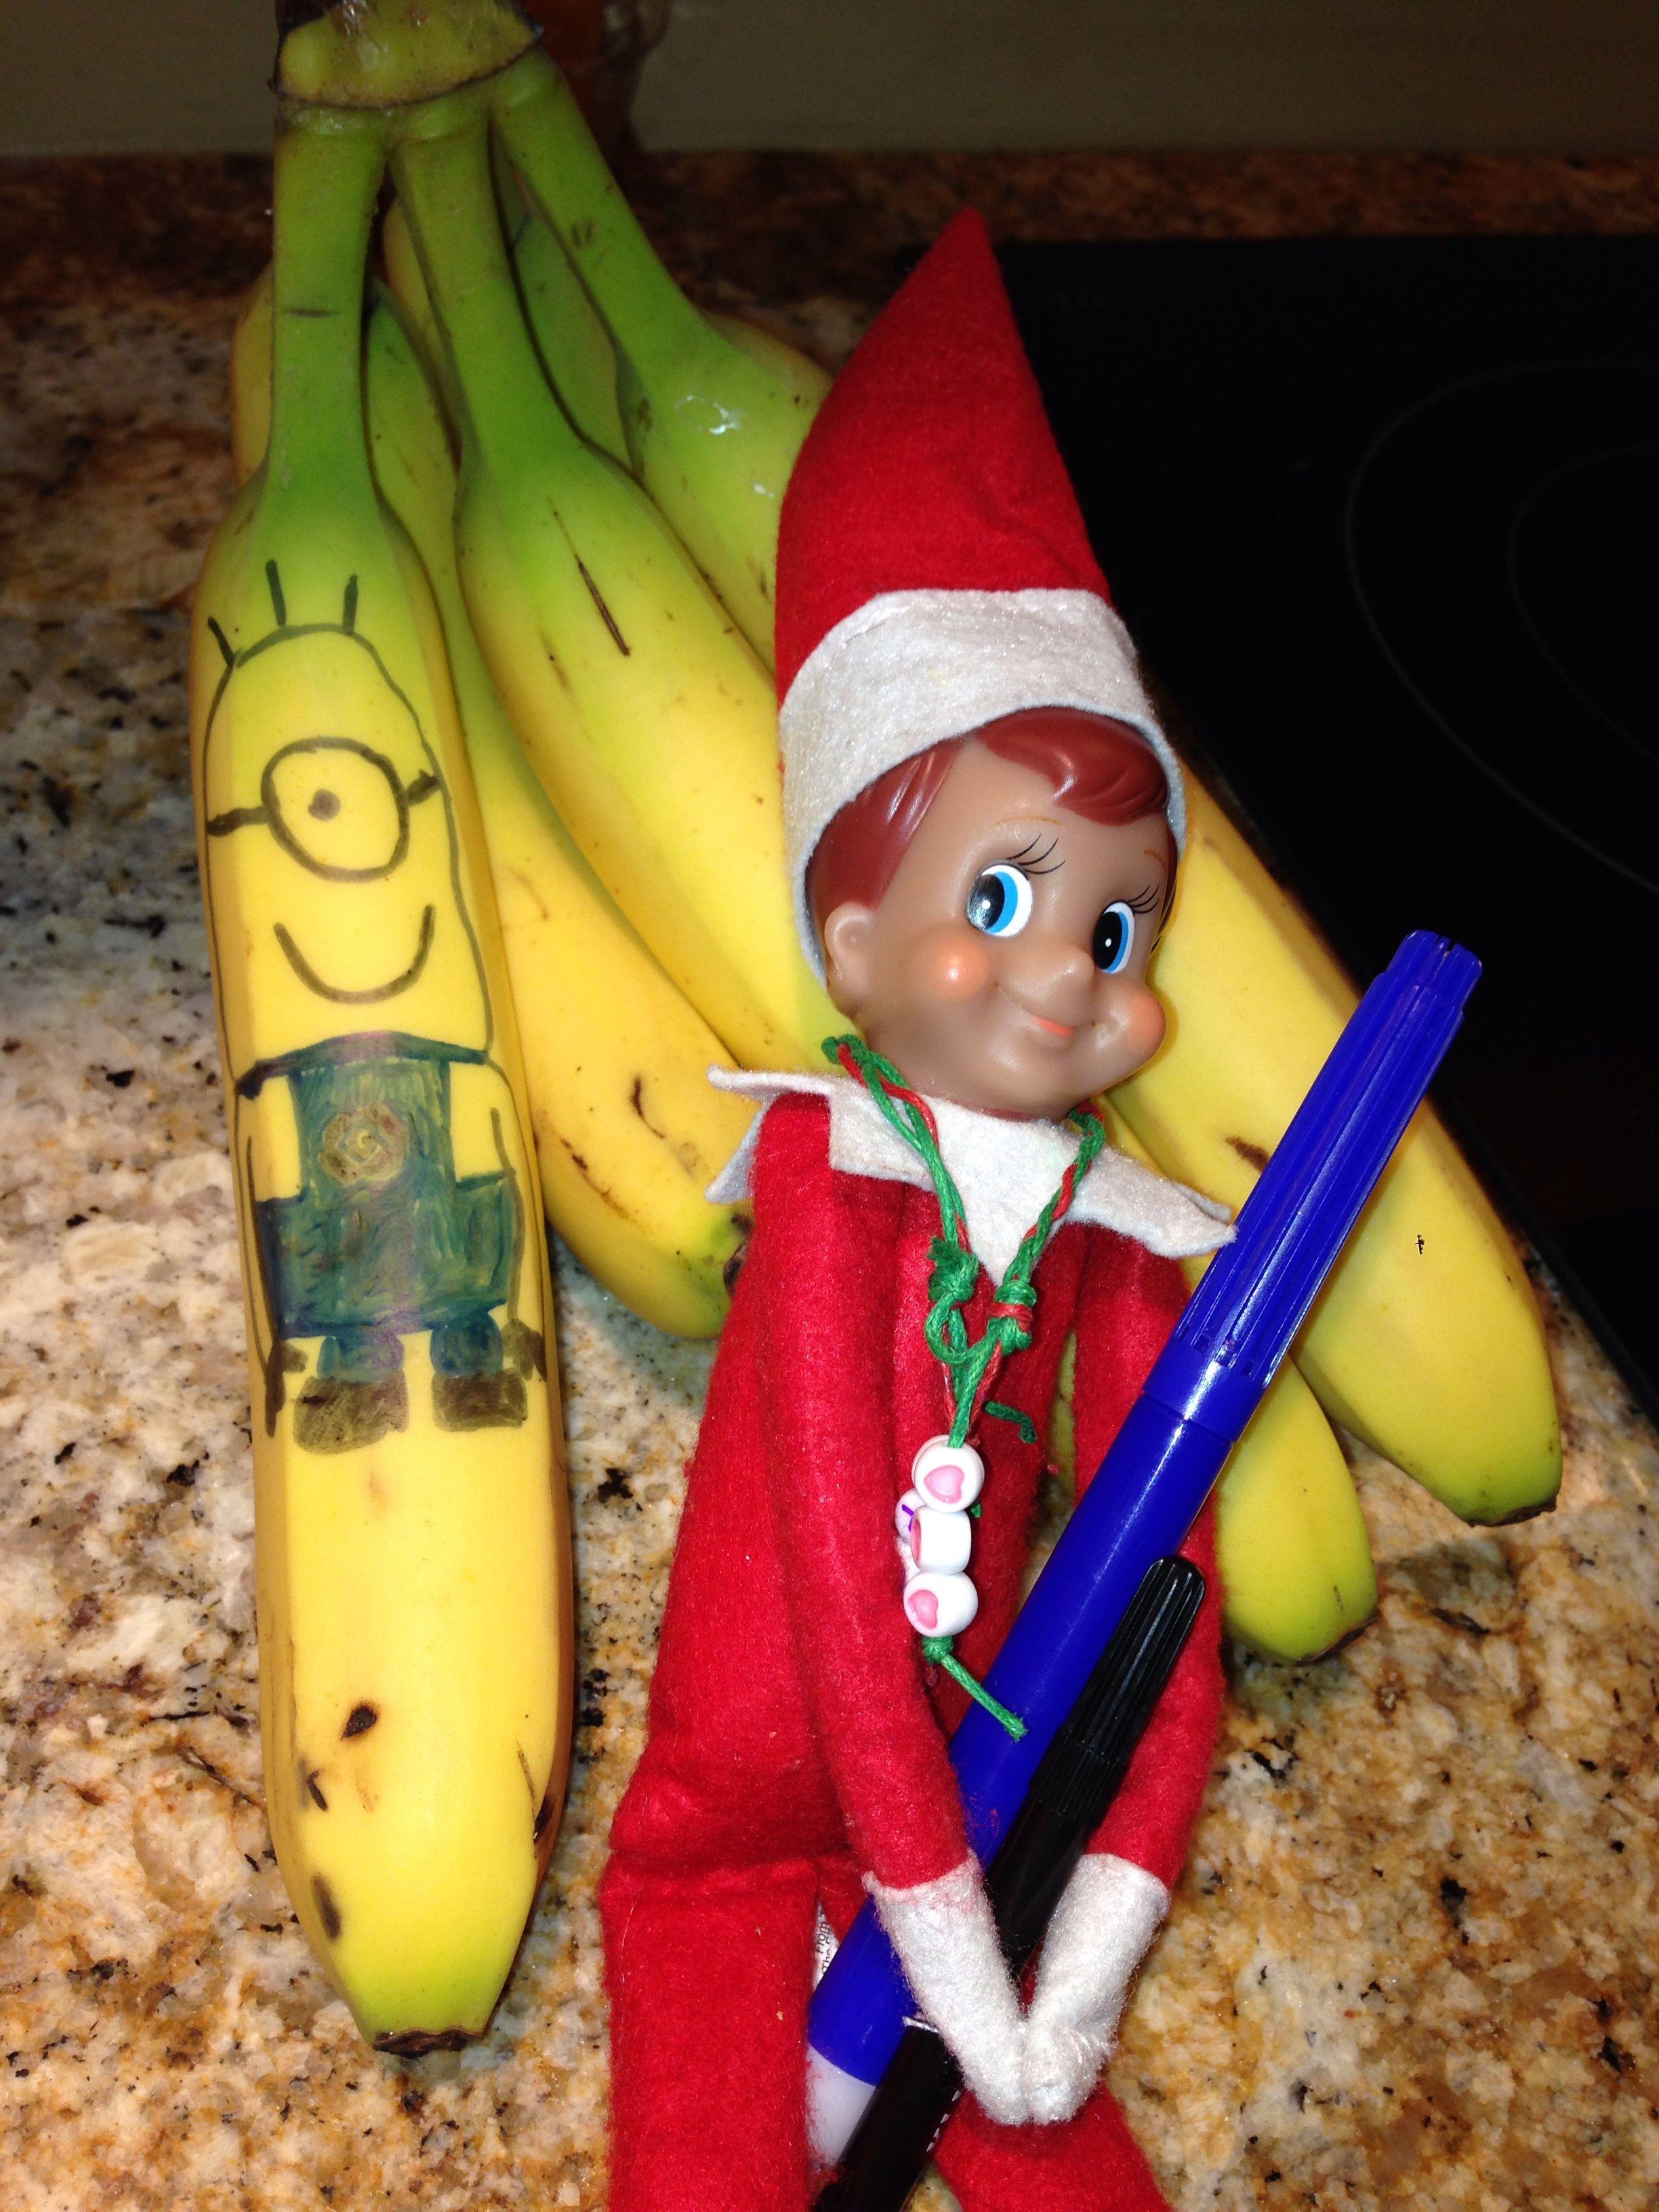 The Elf On The Shelf Elf Love Bananas Our Boy Pinterest